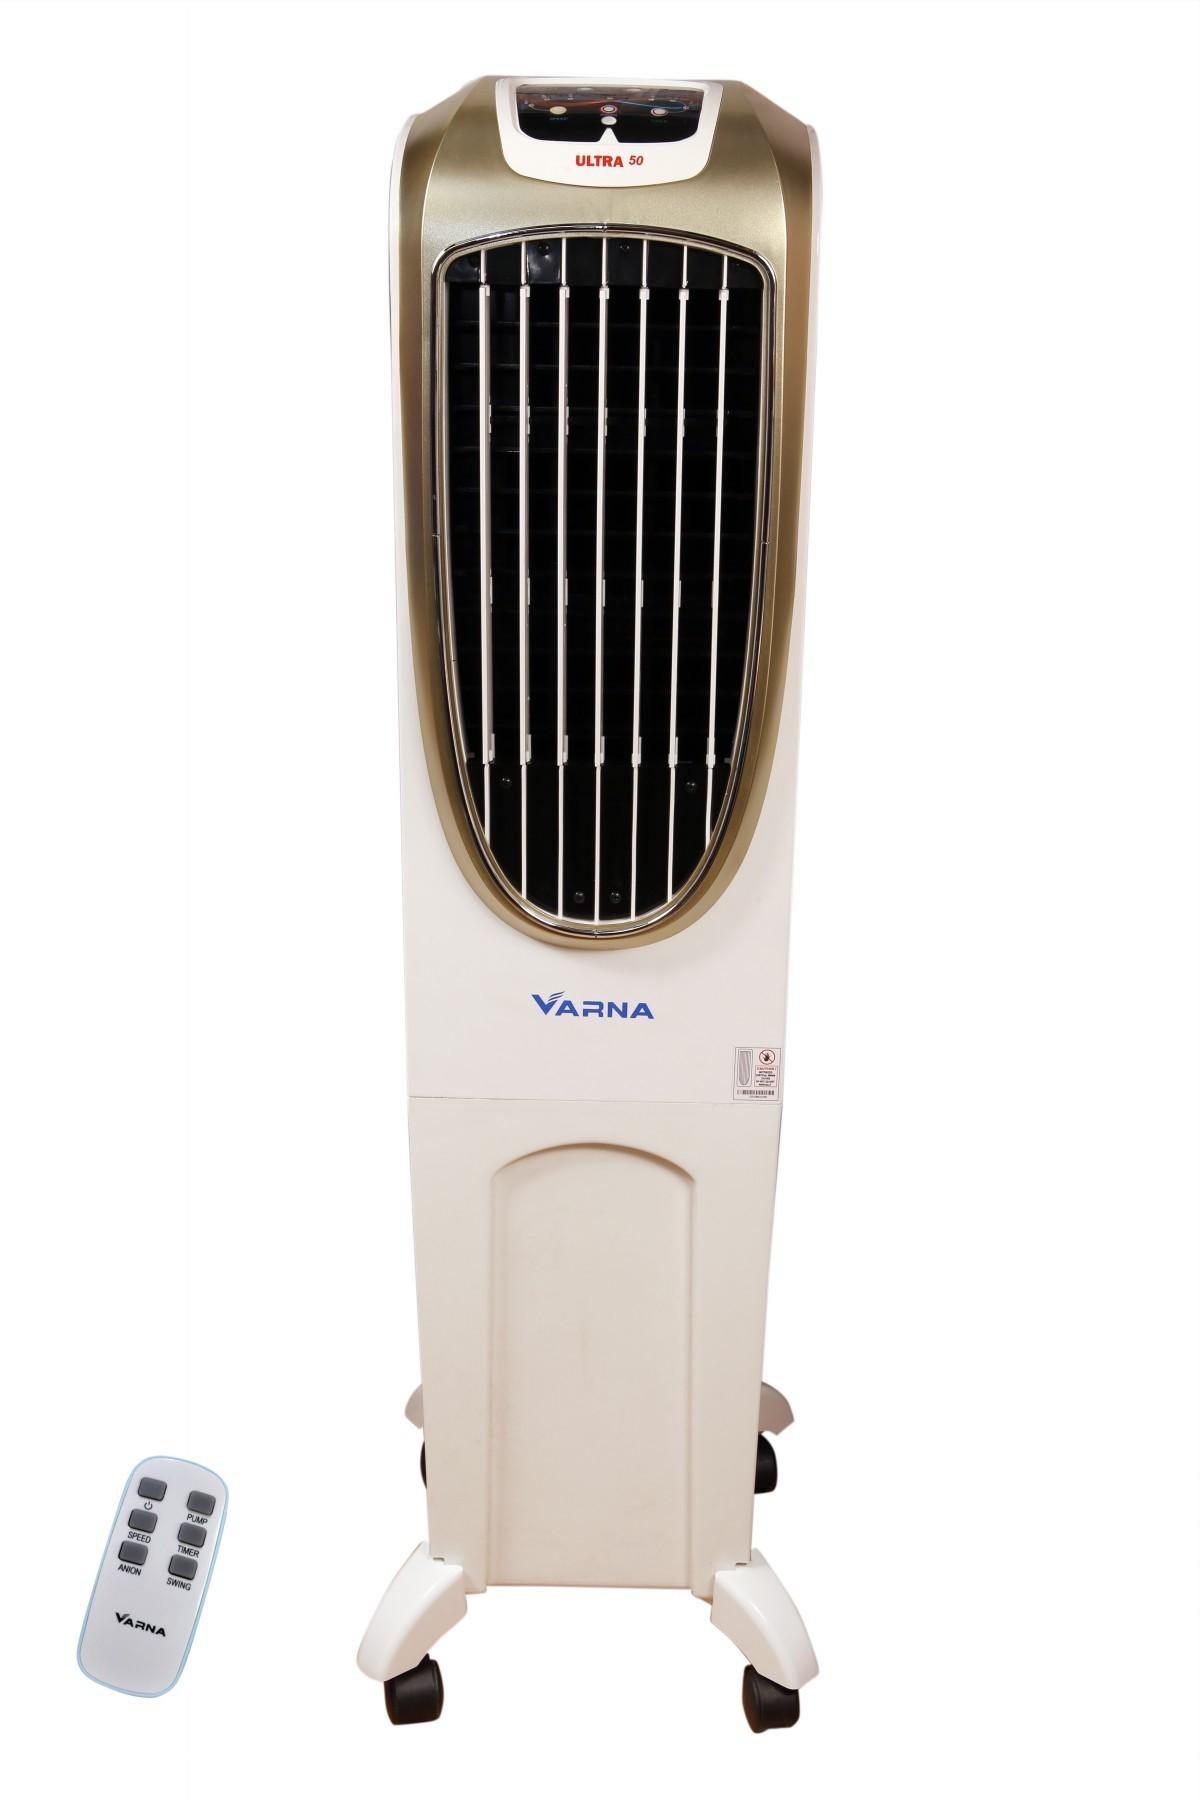 Varna ULTRA 50R Tower Air Cooler Image